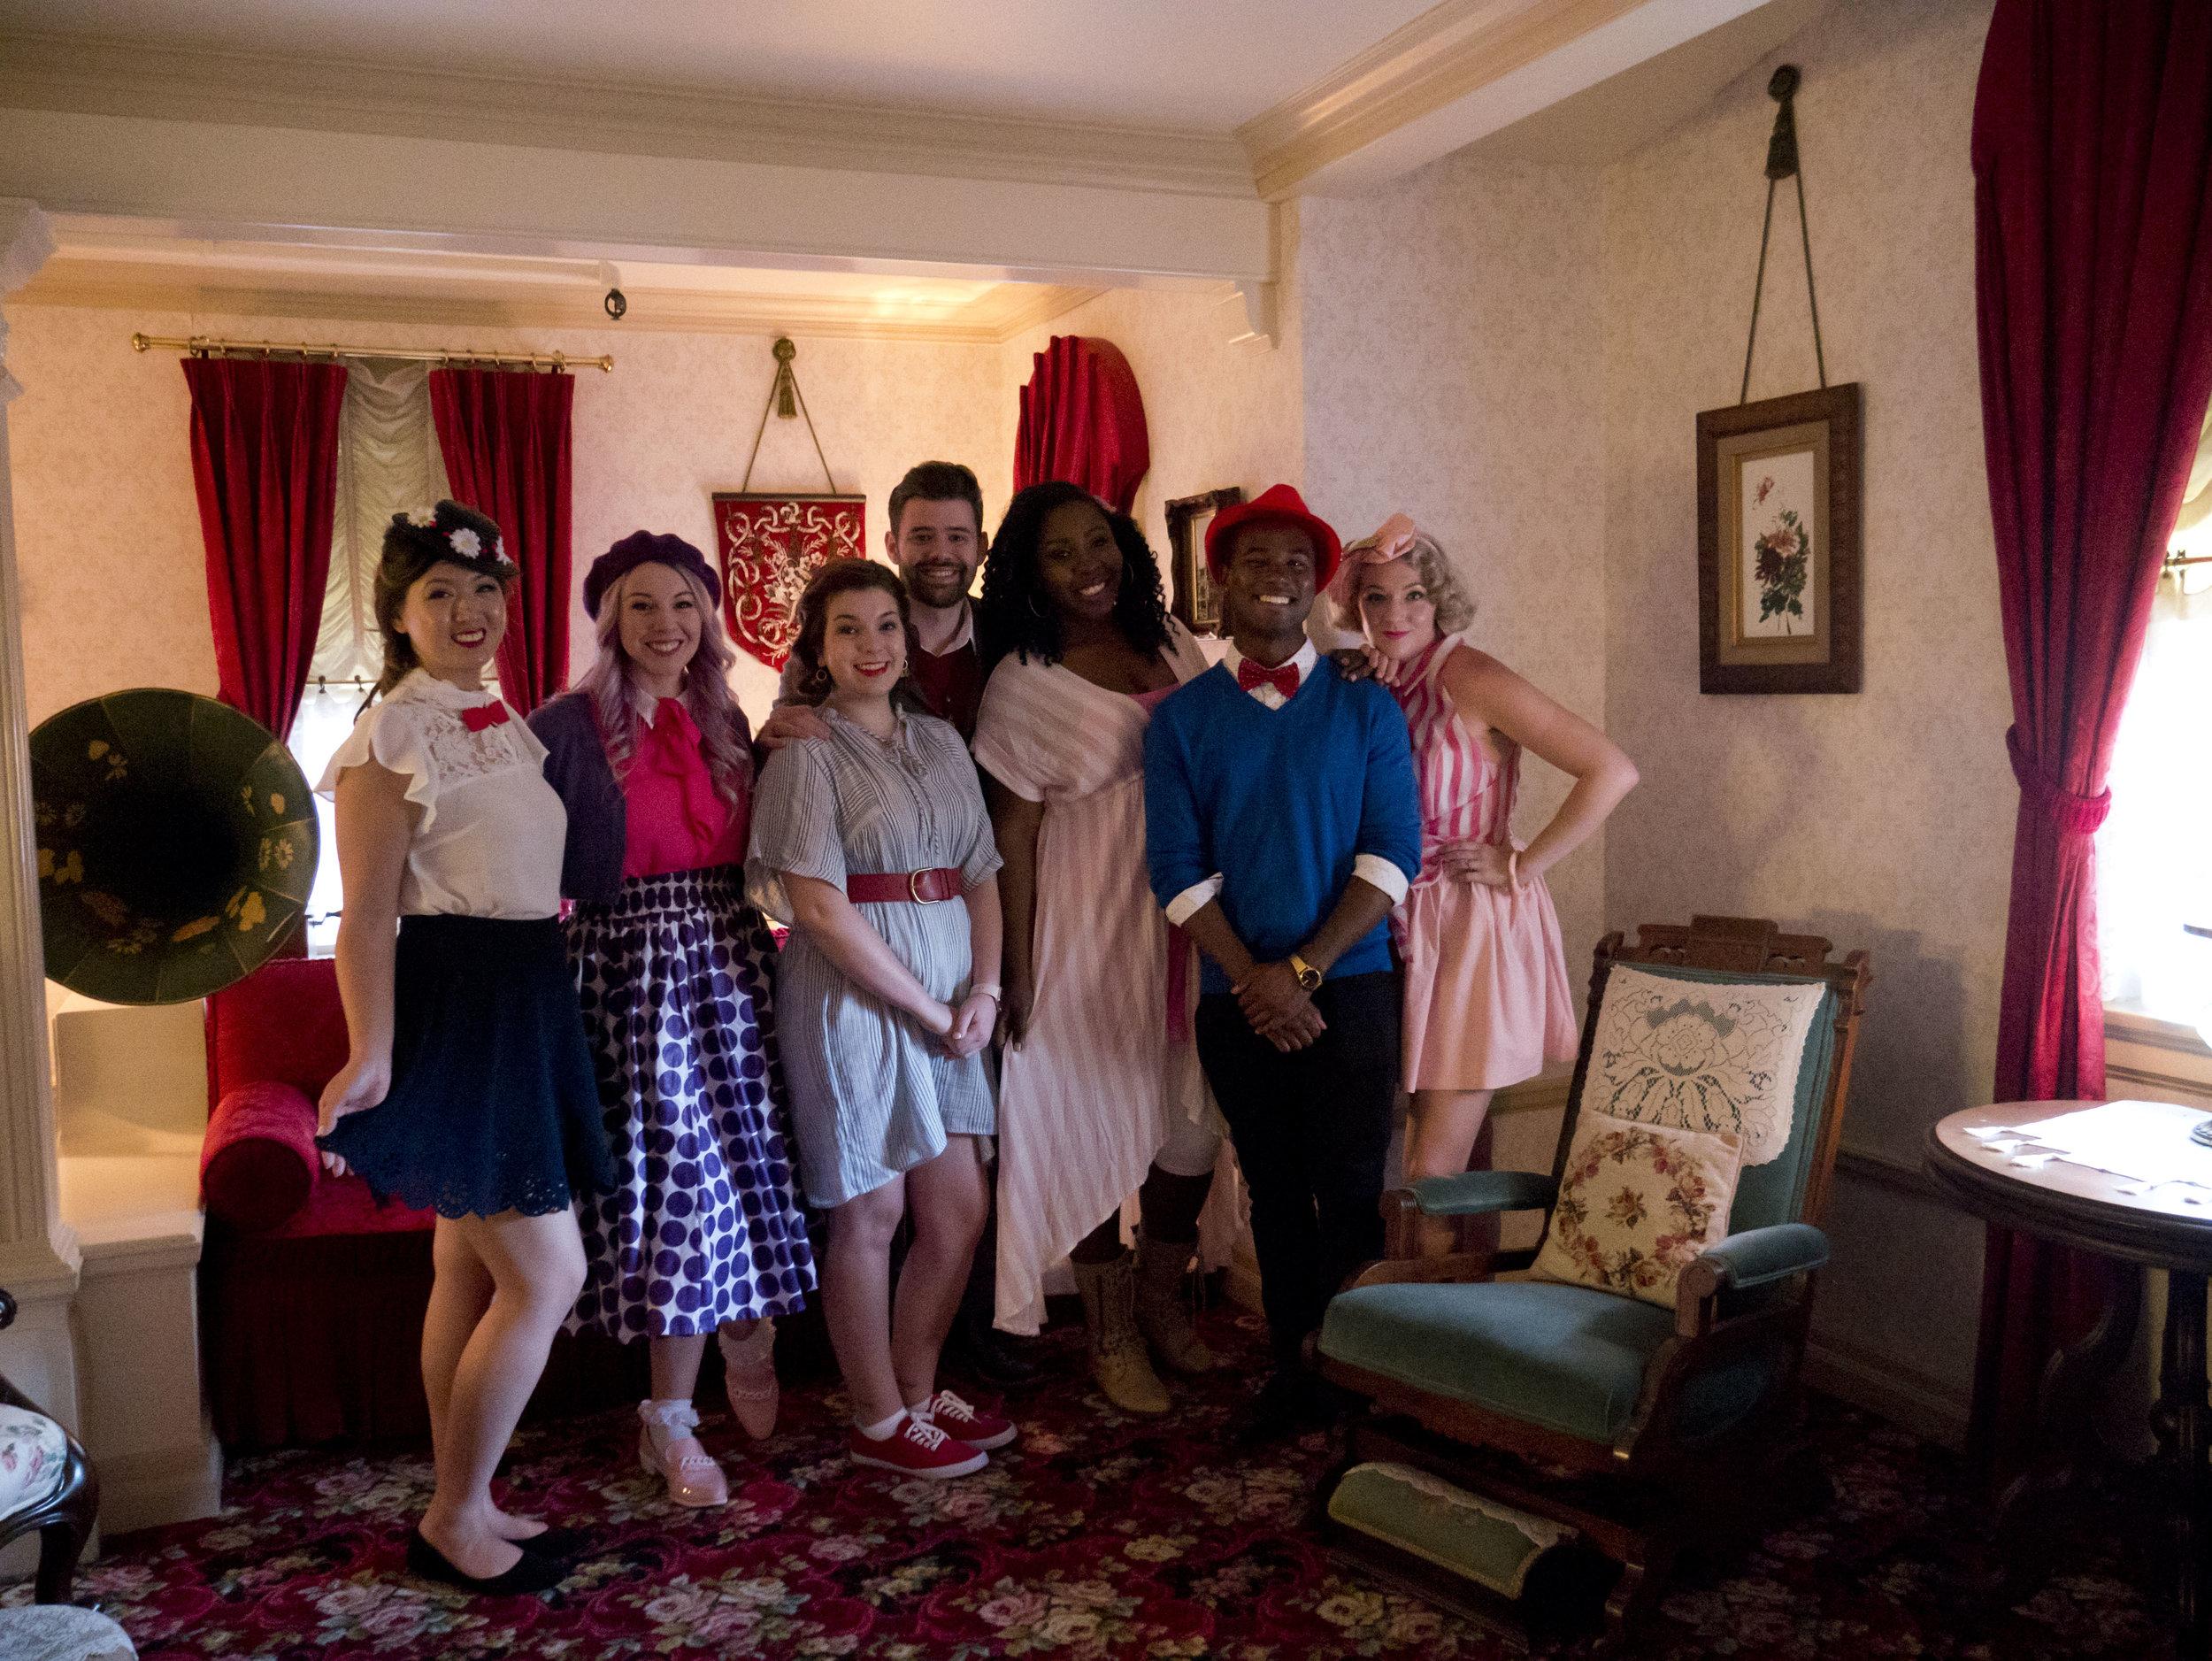 3-18-19 Mary Poppins 001.jpg